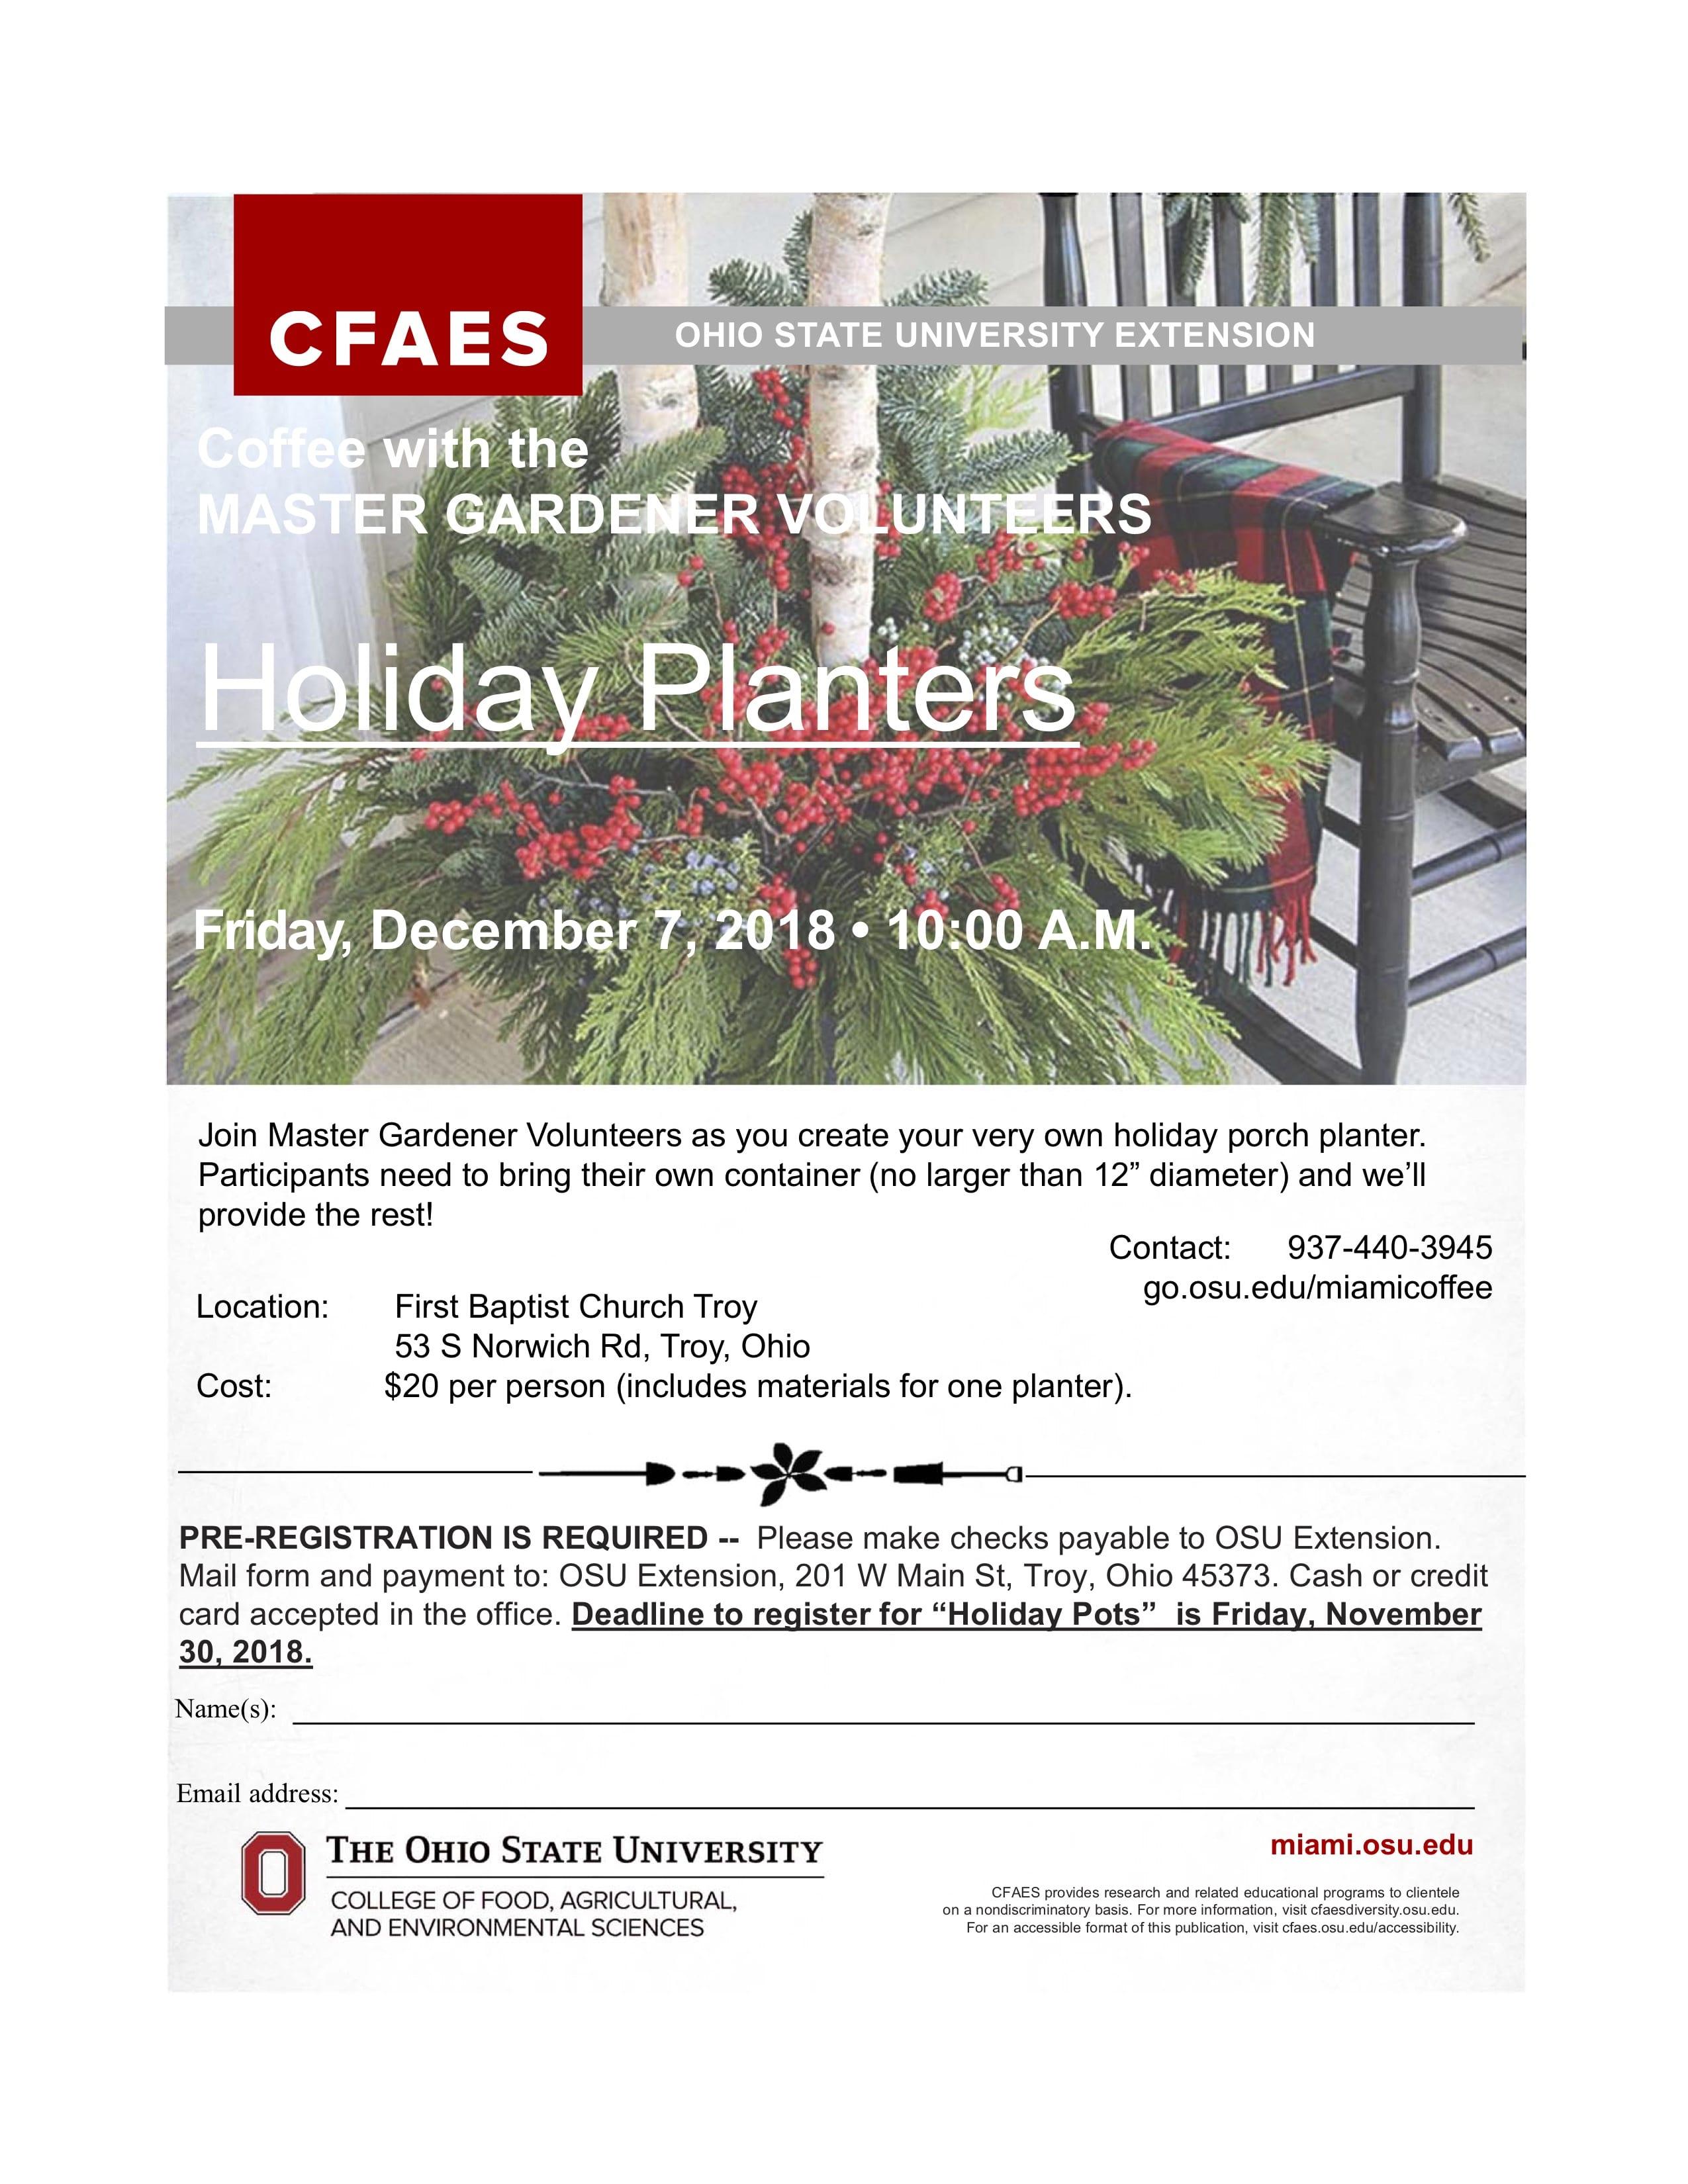 Create your own Holiday Planter with the Master Gardener ... on vermont garden, newcastle garden, amsterdam garden, paris garden,